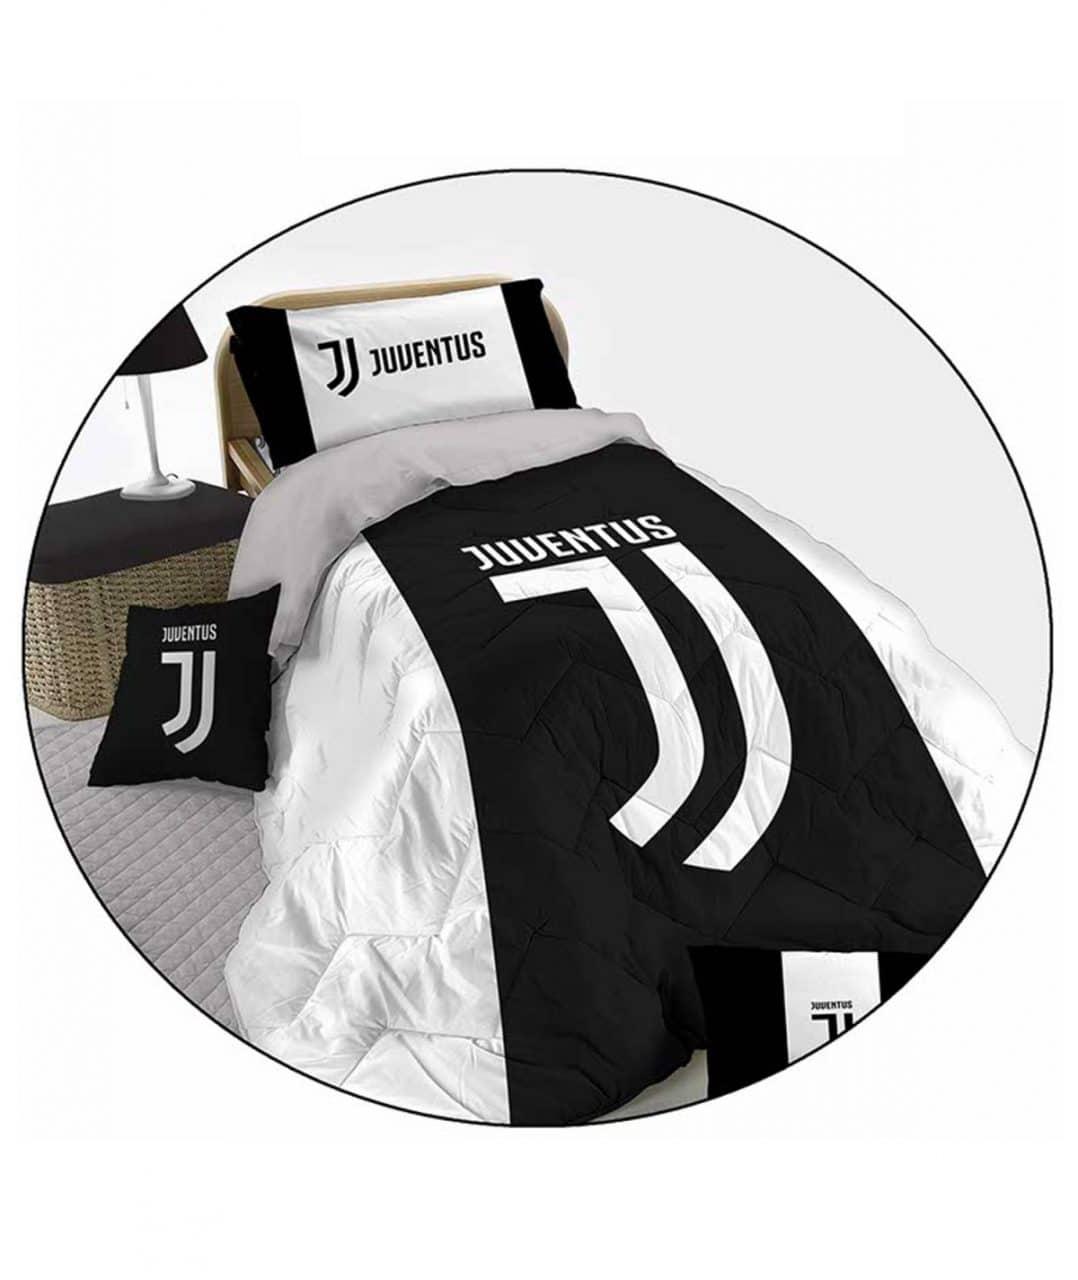 Copripiumino Matrimoniale Juventus.Trapunta Piumone Microfribra Fc Juventus Ufficiale Letto Singolo 1